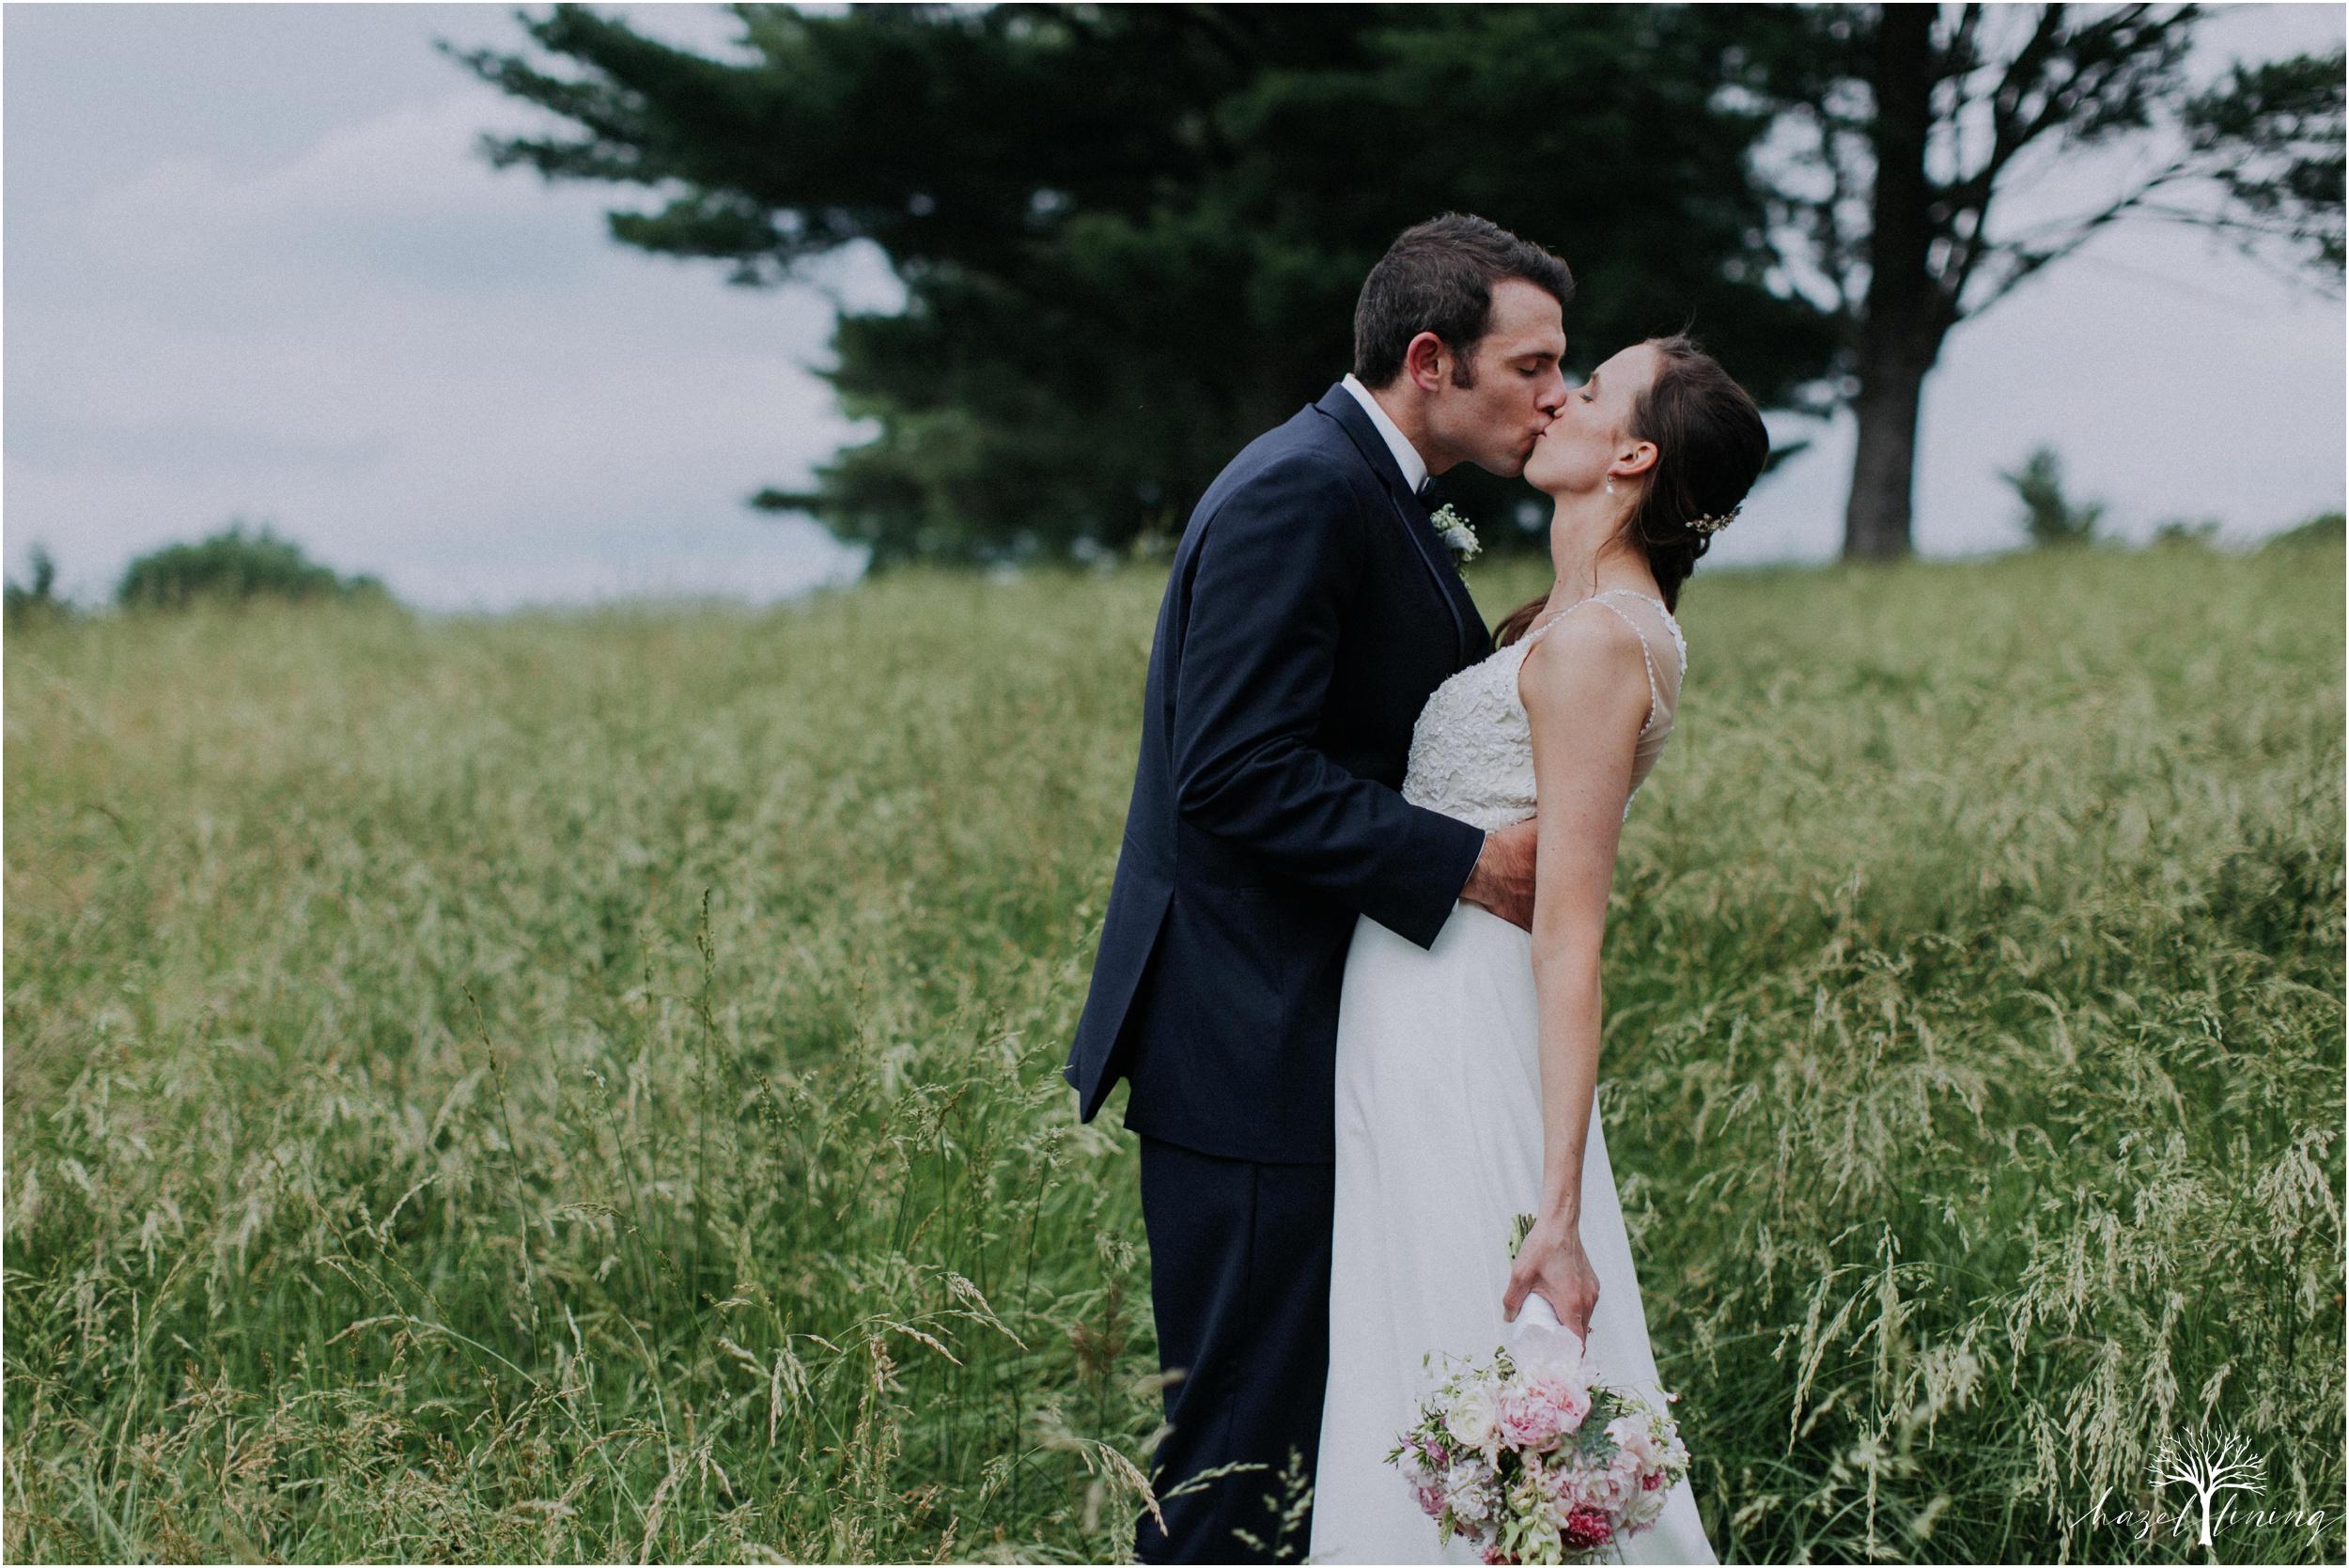 hazel-lining-travel-wedding-elopement-photography_0103.jpg